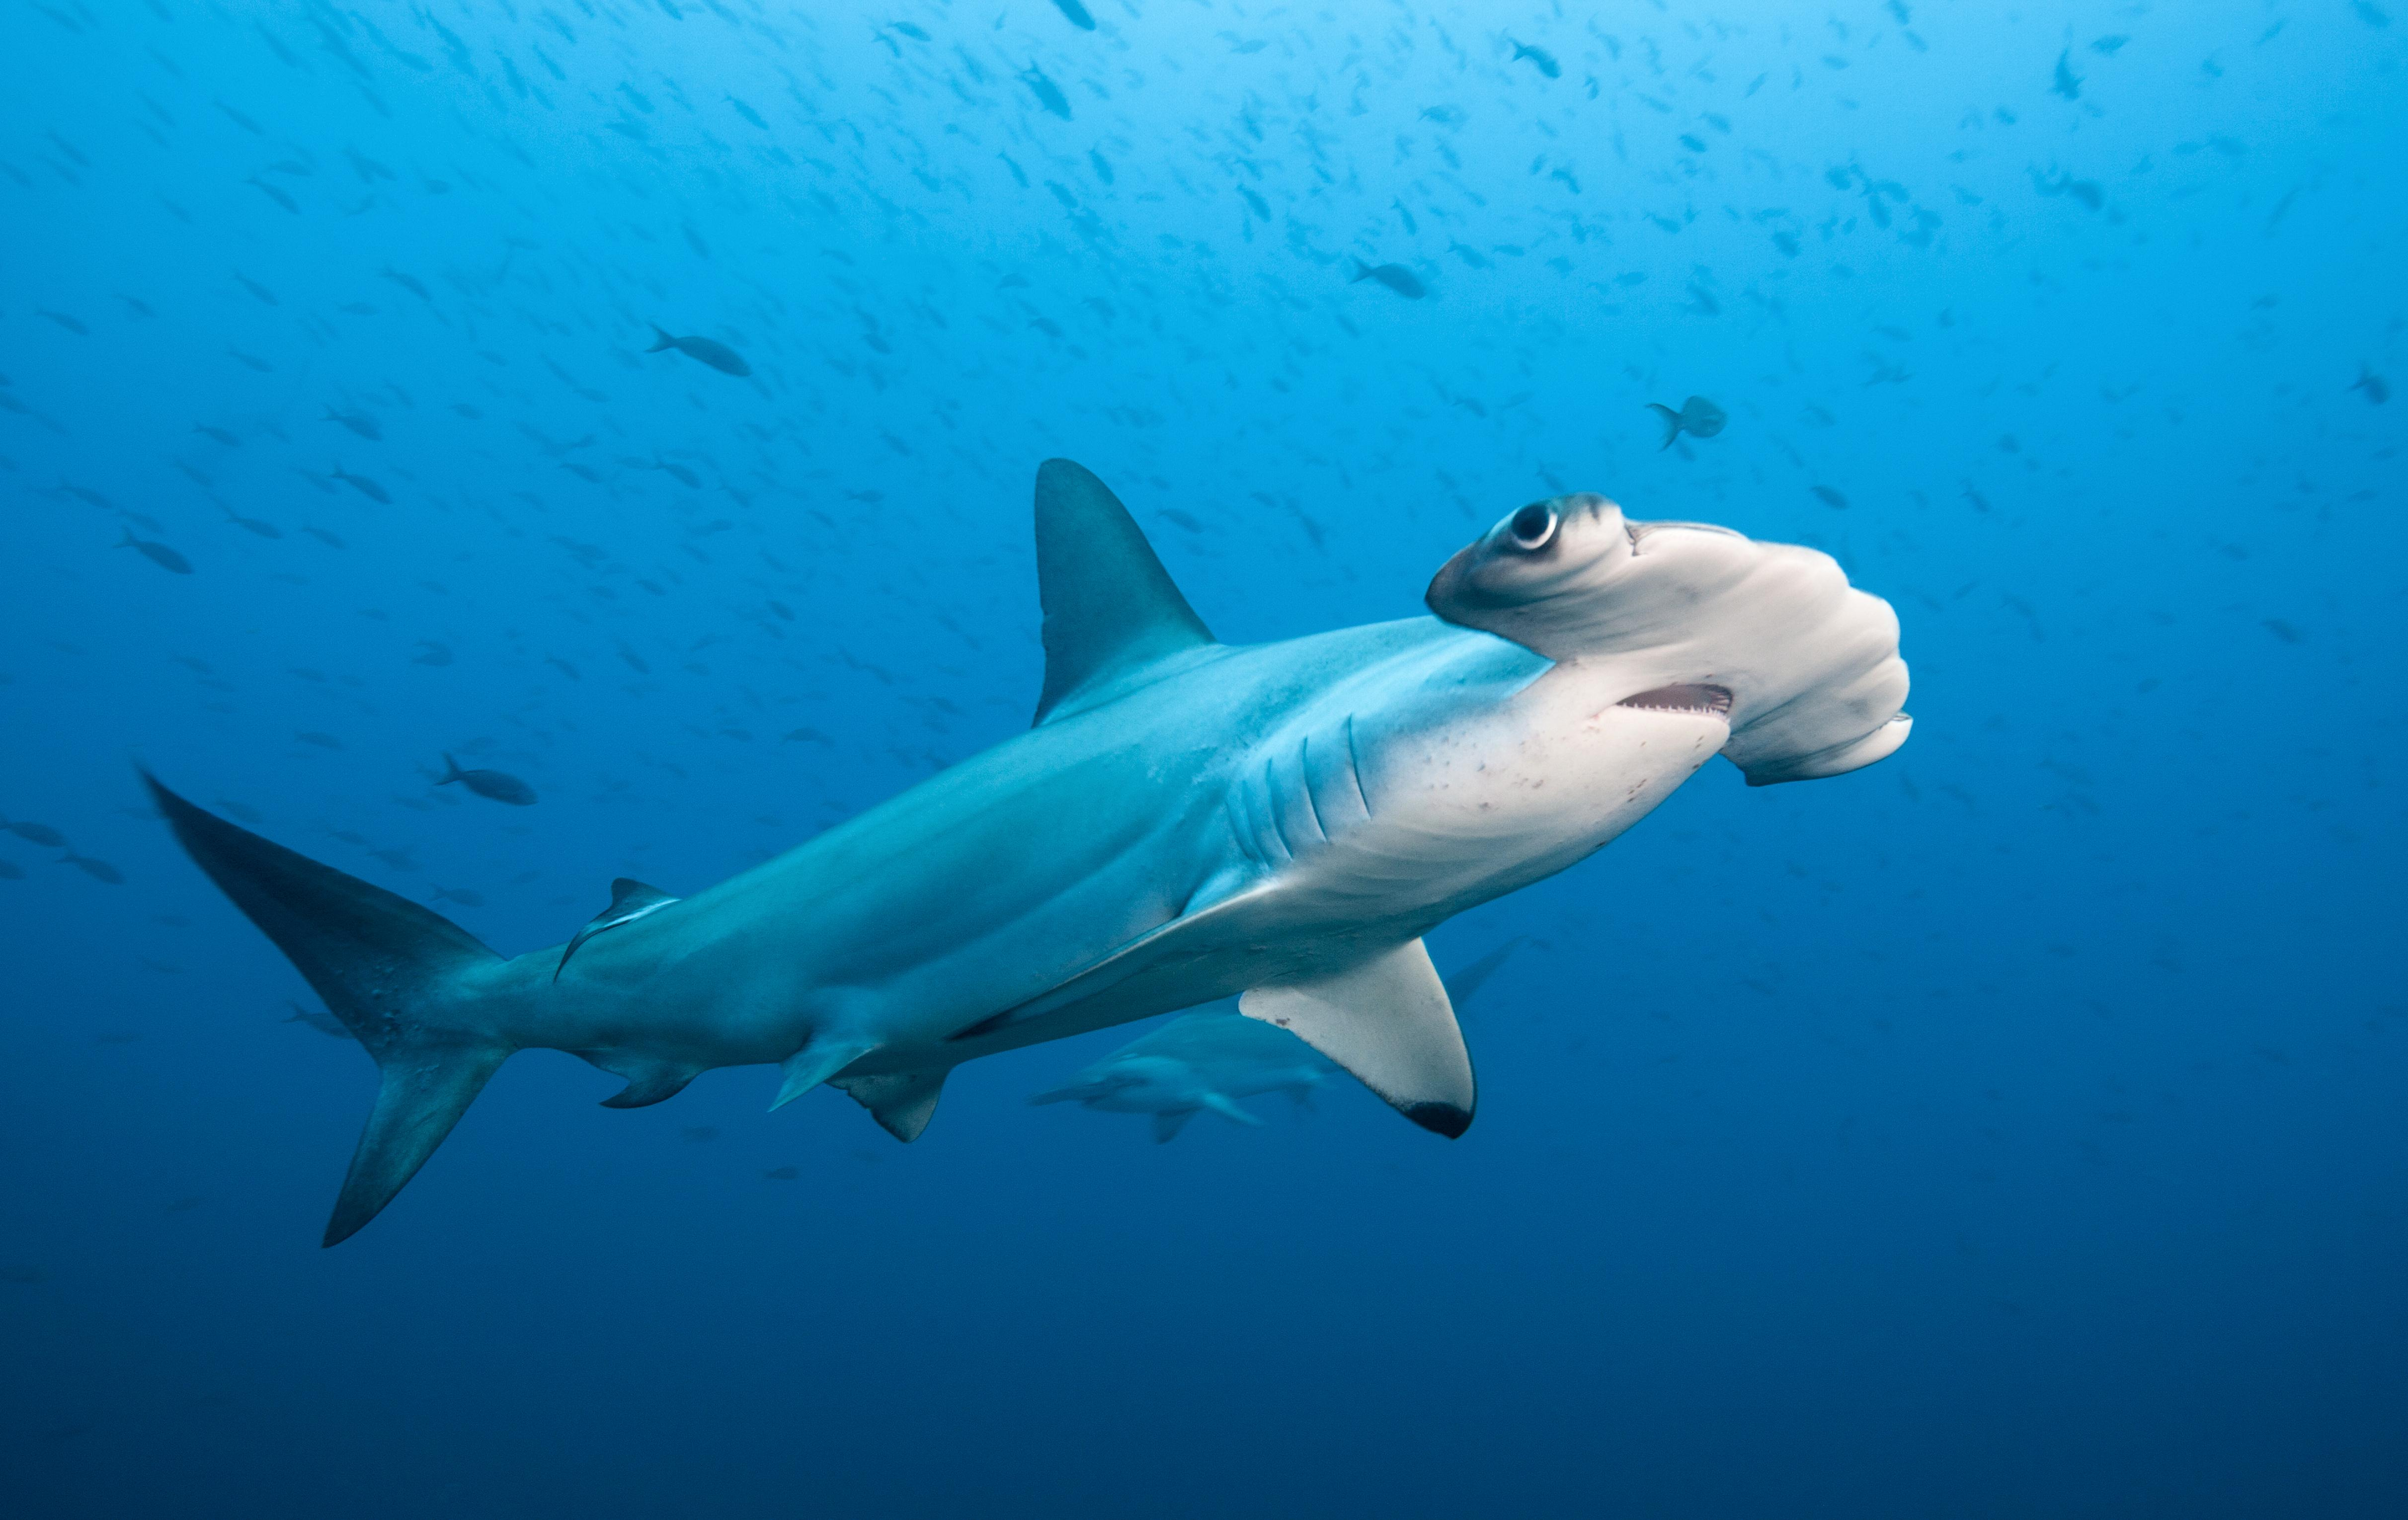 Hammerhead shark migration gives new hope for conservation (Constantine Alexander's Journal)